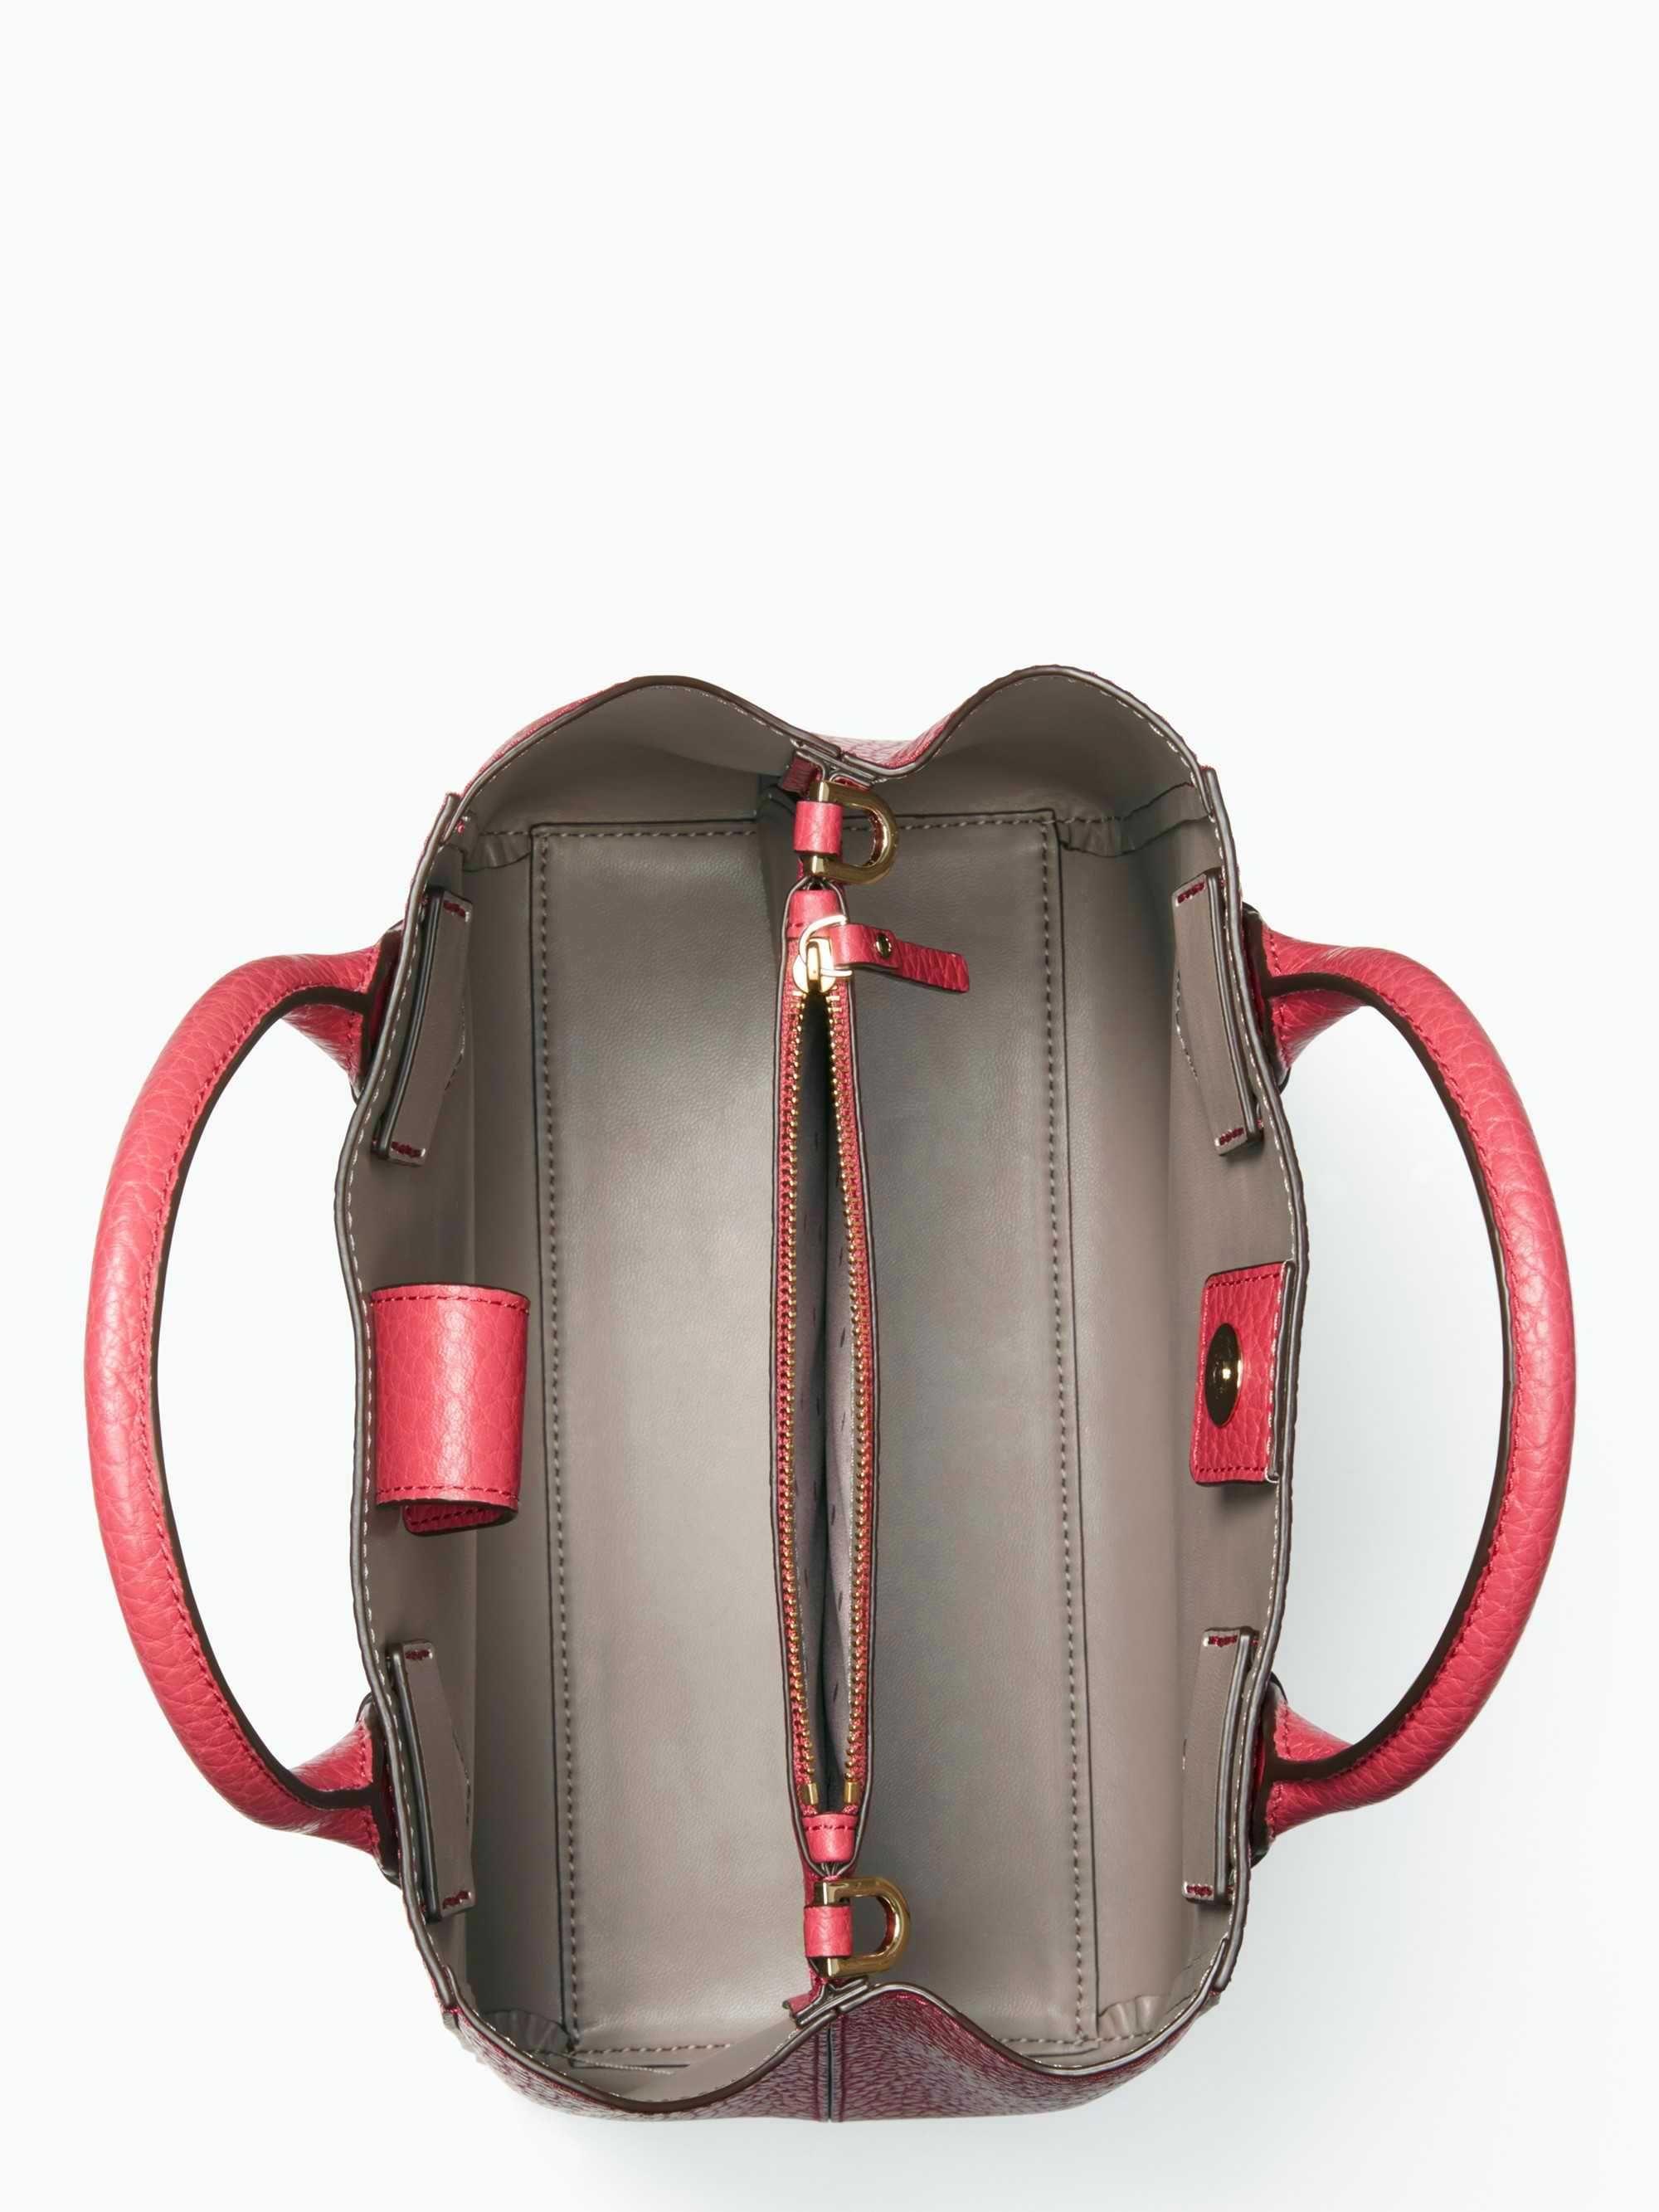 226ff01dde82 Kate Spade Bags Sale Canada - Kate Spade Watches Silver Fashion Cheap. wholesale  kate-spadehandbags.com Zvrmyysqyp